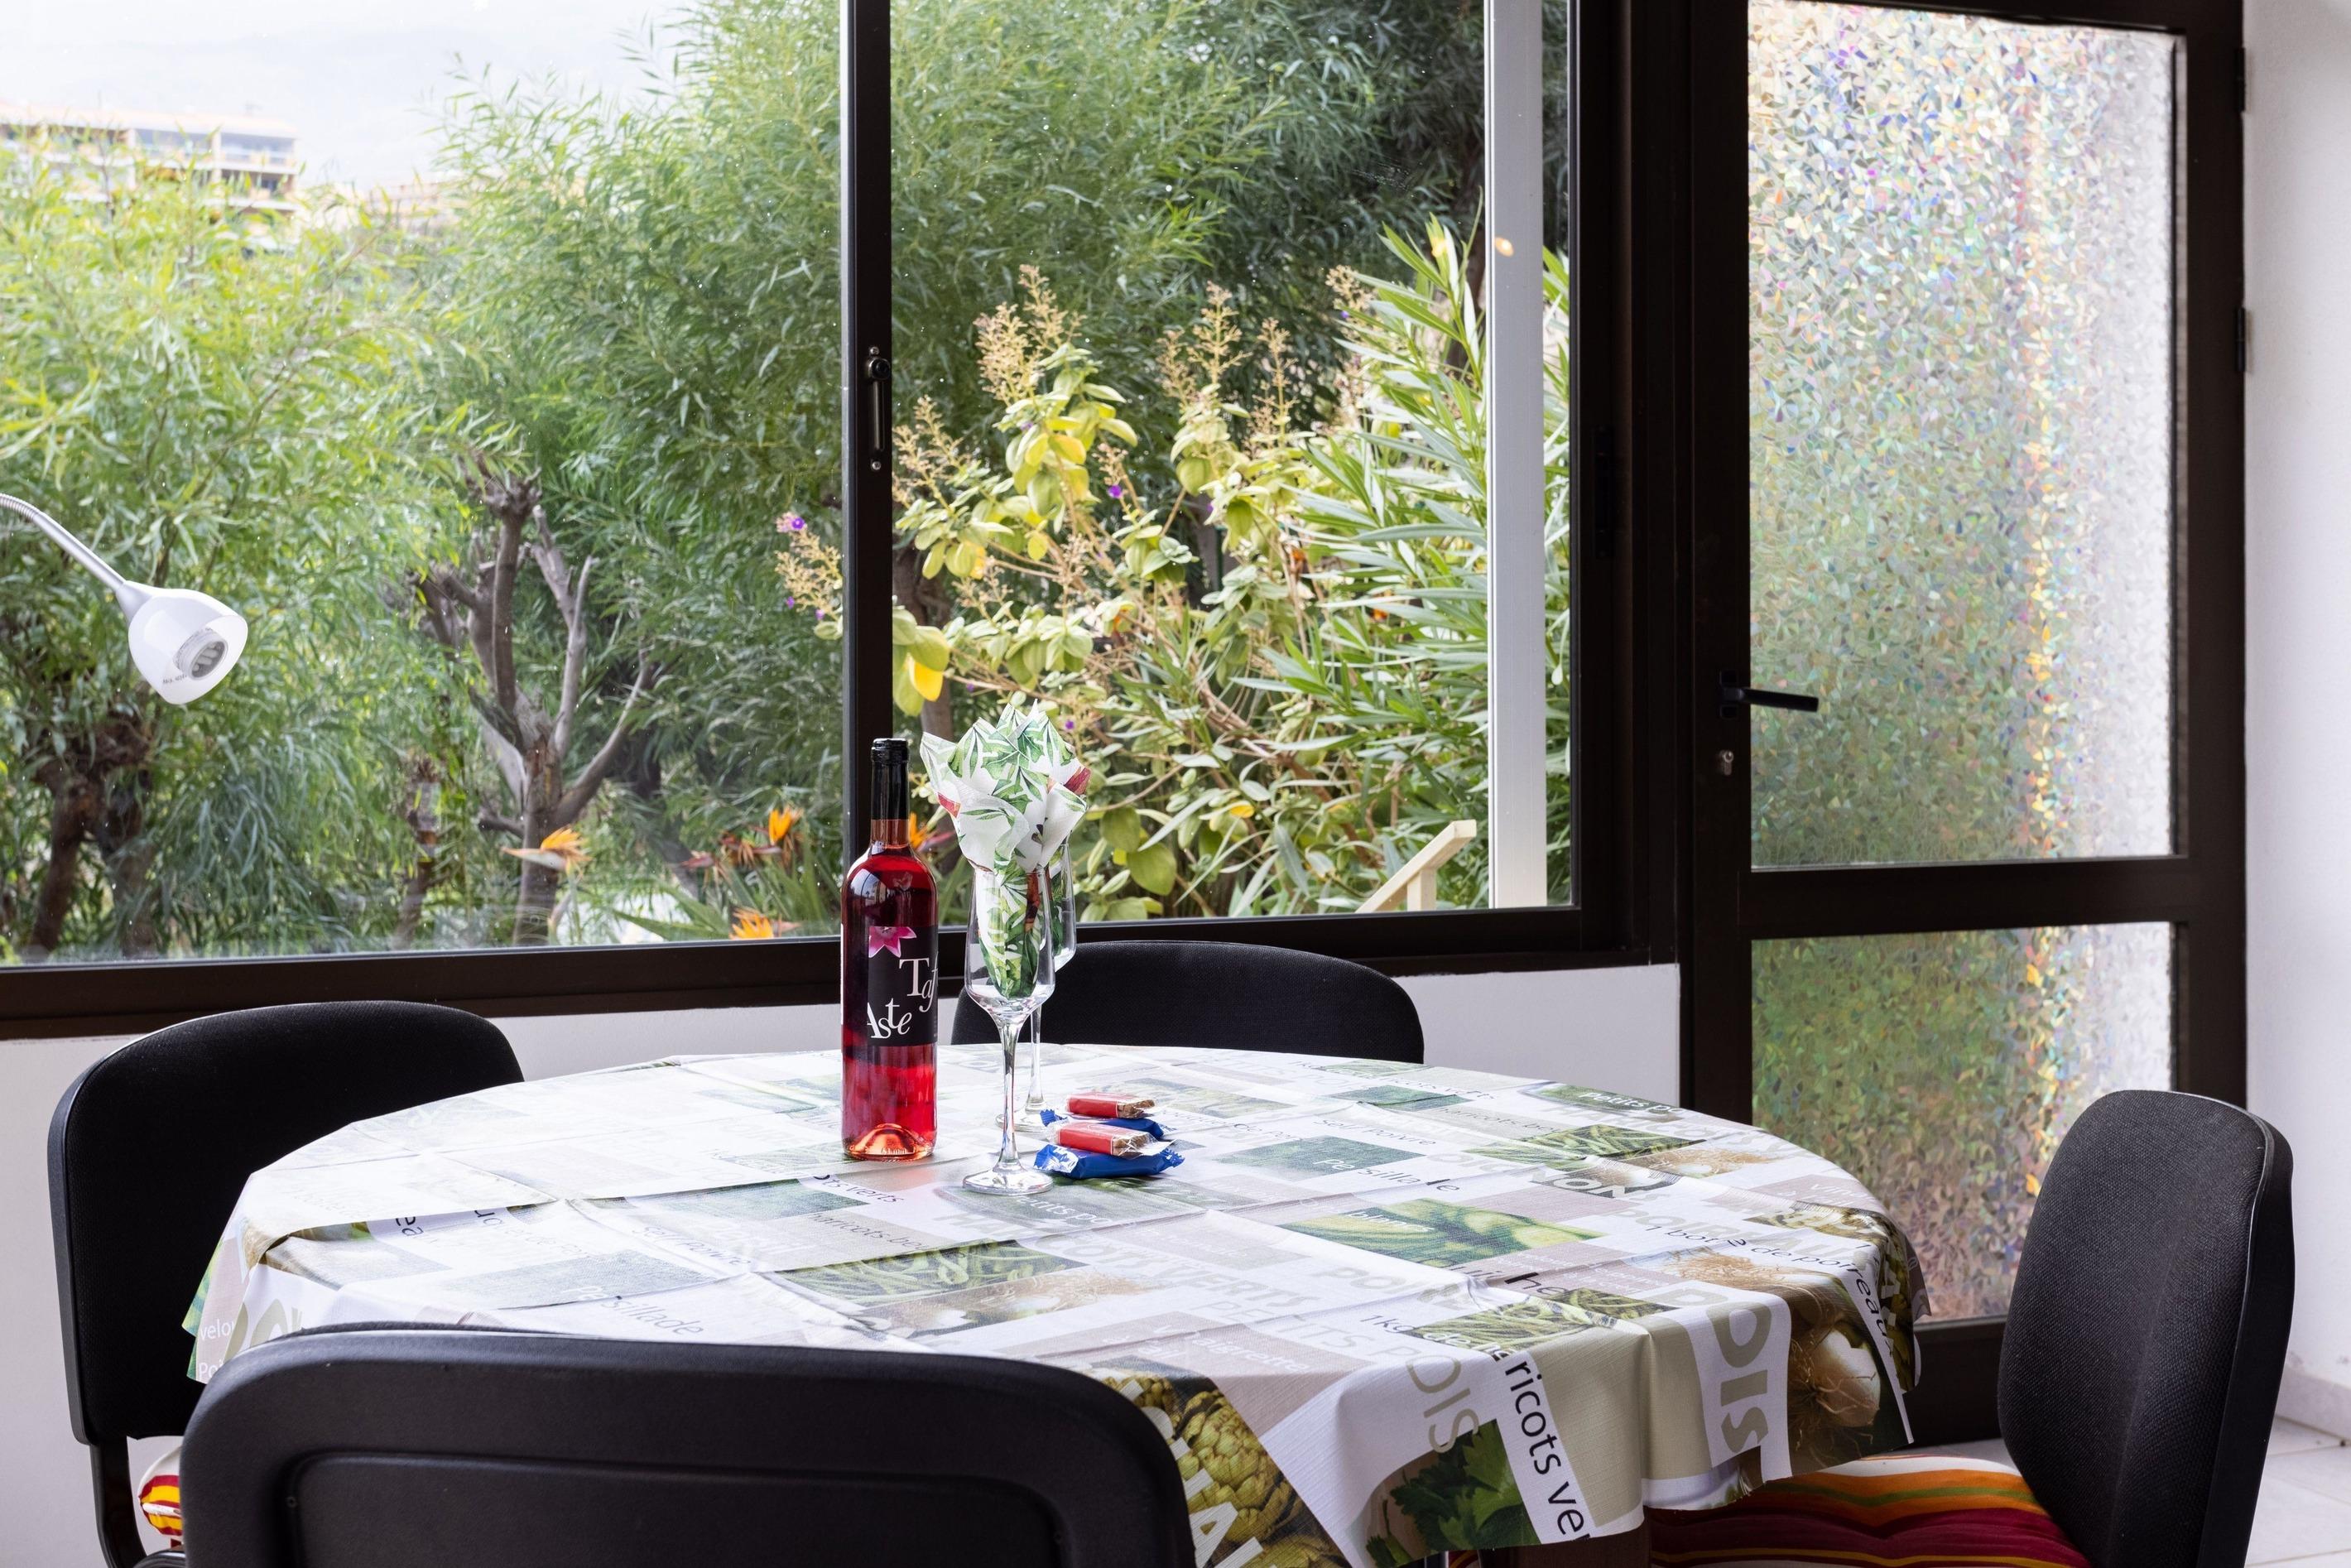 Appartement de vacances Fewo Strelitzia, im Grünen, am kleinen See, direkt am Strelitziengarten, mit Pool, Grill,  (2492987), Santa Ursula, Ténérife, Iles Canaries, Espagne, image 6